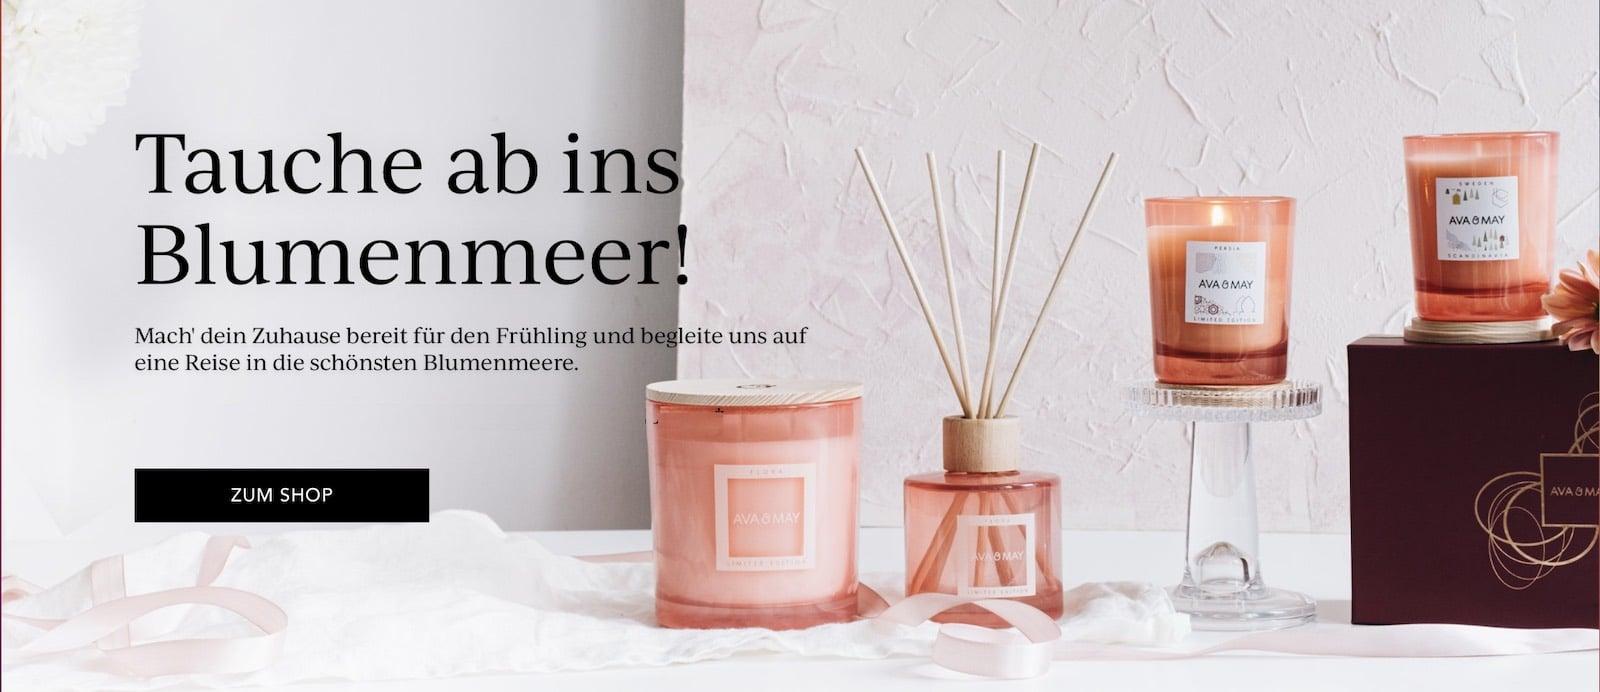 AVA & MAY Flora große Duftkerze Duftstäbchen Erafhrungen Geranie Kamille Pfingstrose Set